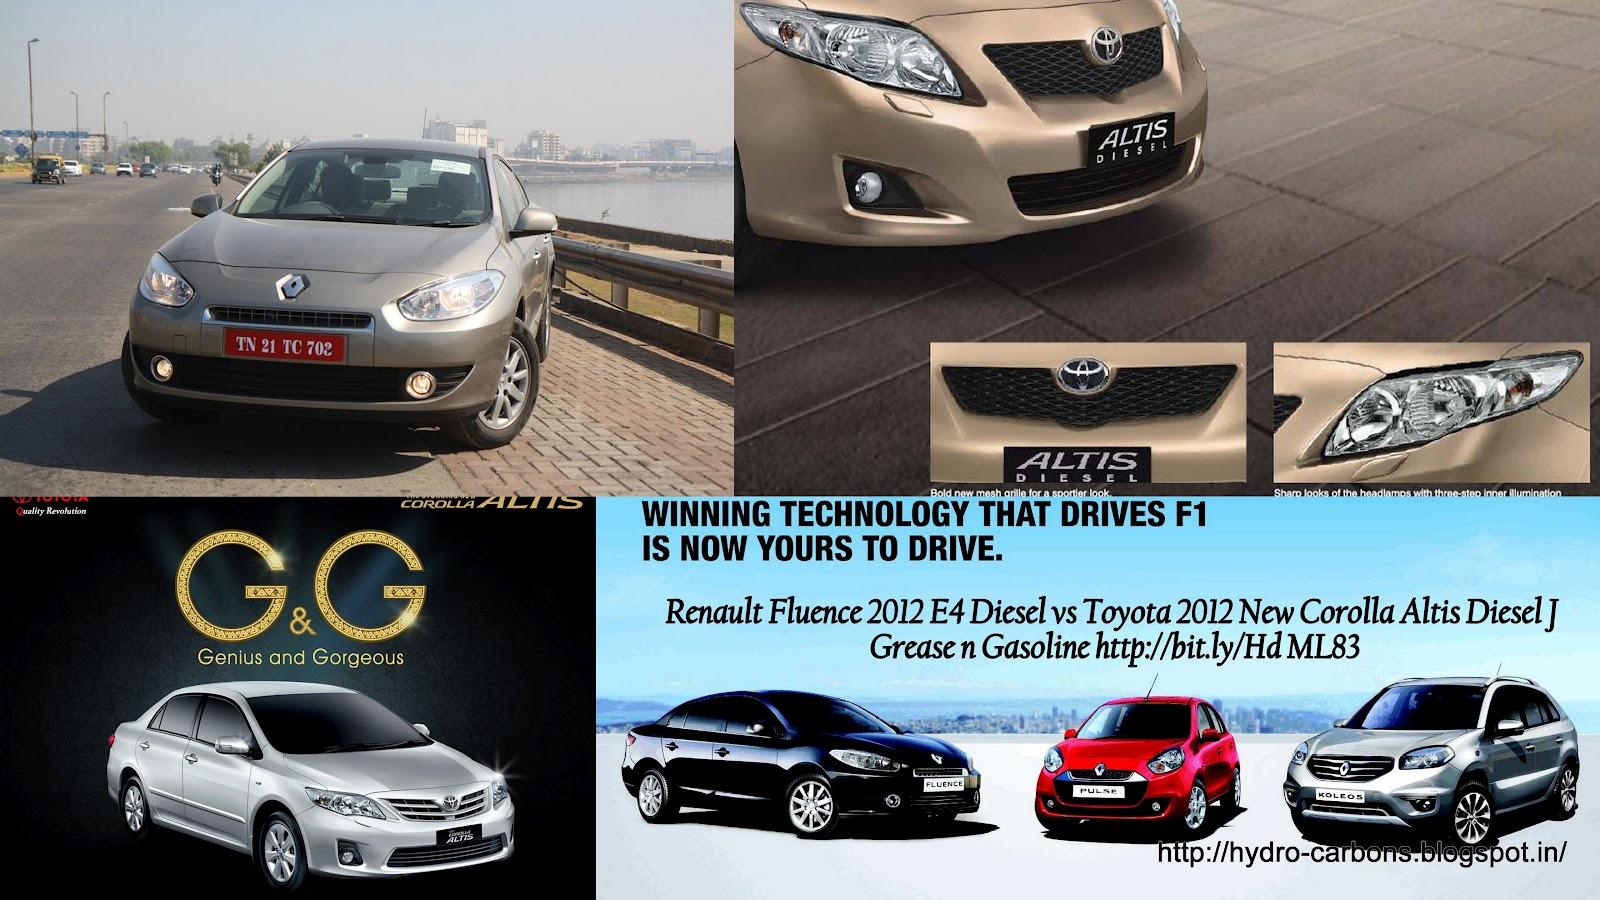 http://4.bp.blogspot.com/-dfXwHdGrwco/T3wn7UZI3oI/AAAAAAAAOy8/ZdM-6-X7yzk/s1600/Renault%2BFluence%2BDiesel.jpg